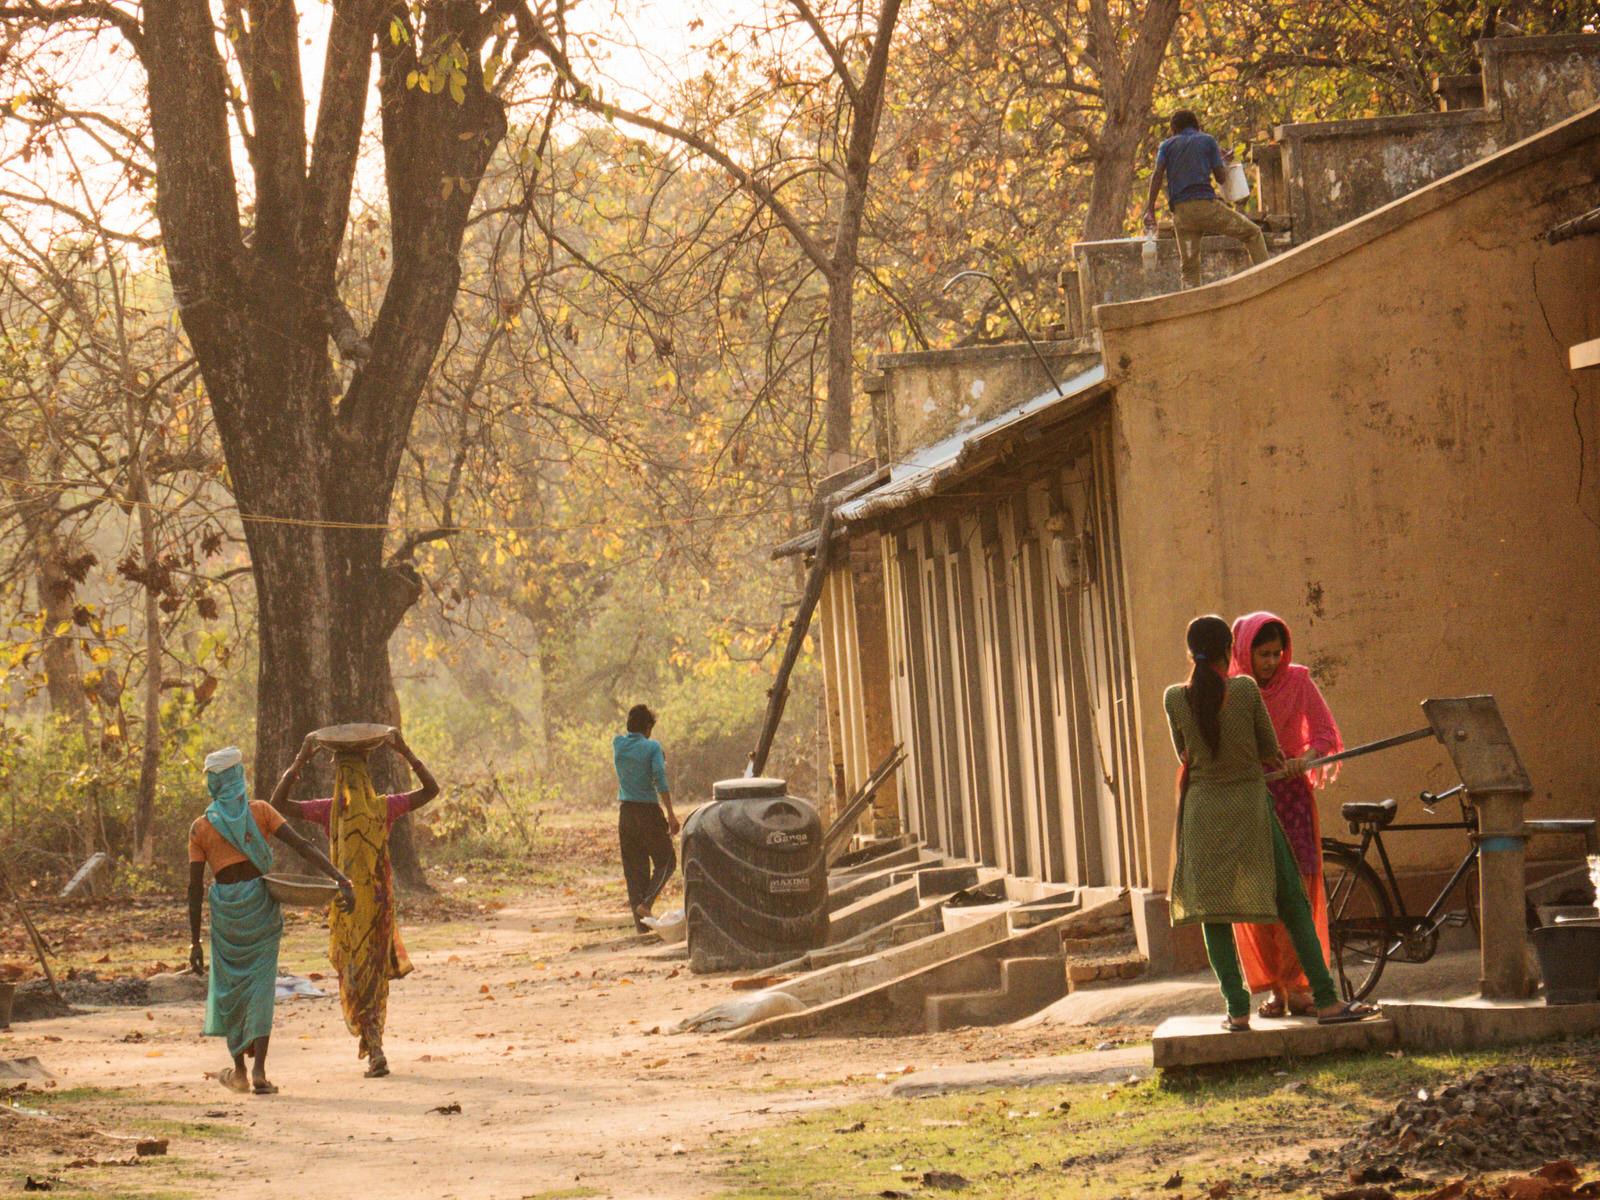 India2016-KathleenHertelPhotography-294.jpg